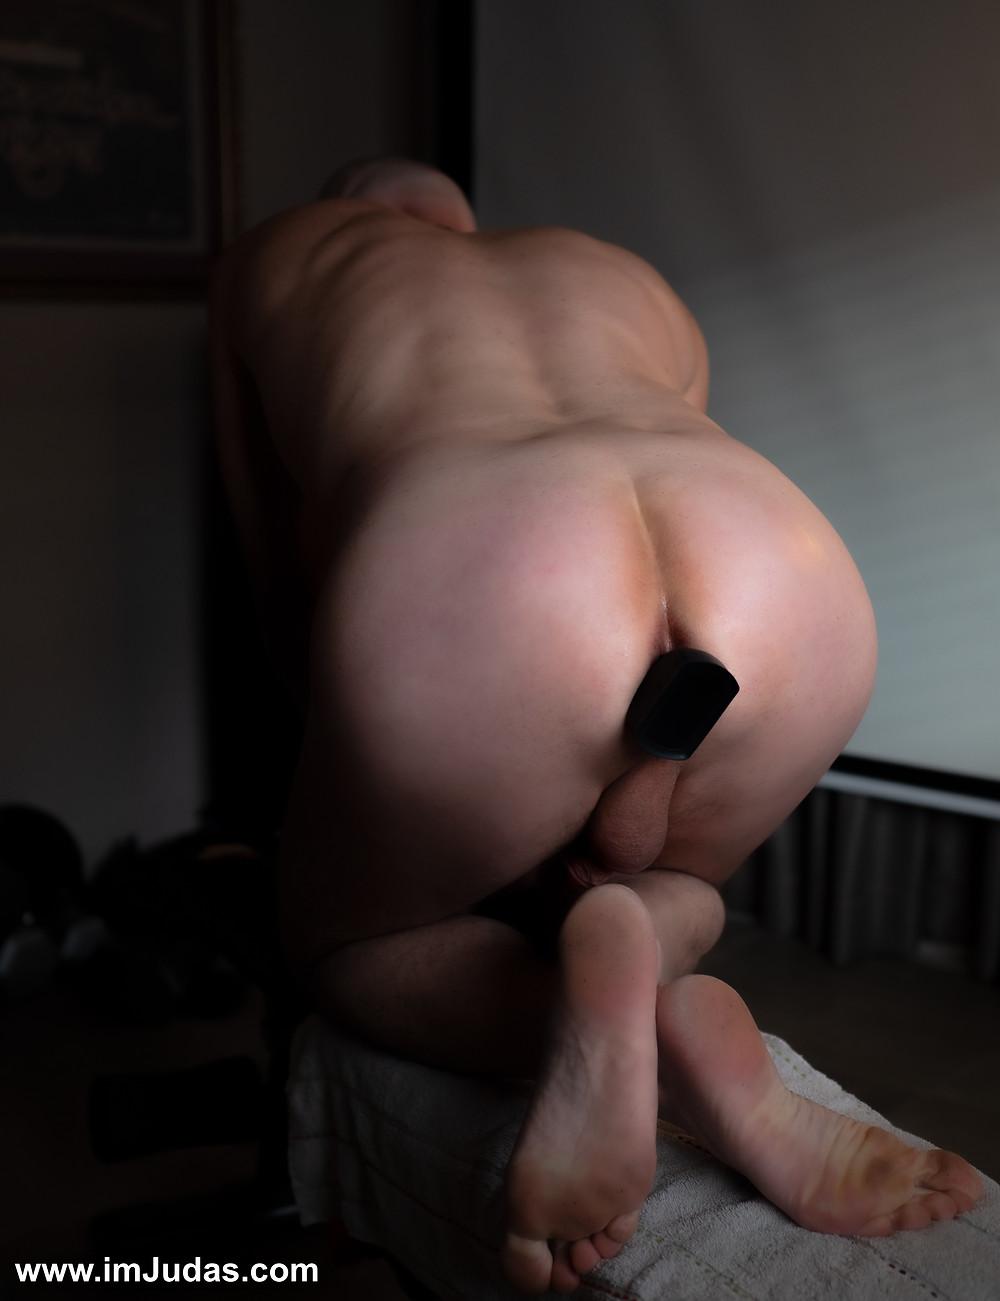 An anal vibrator in my ass